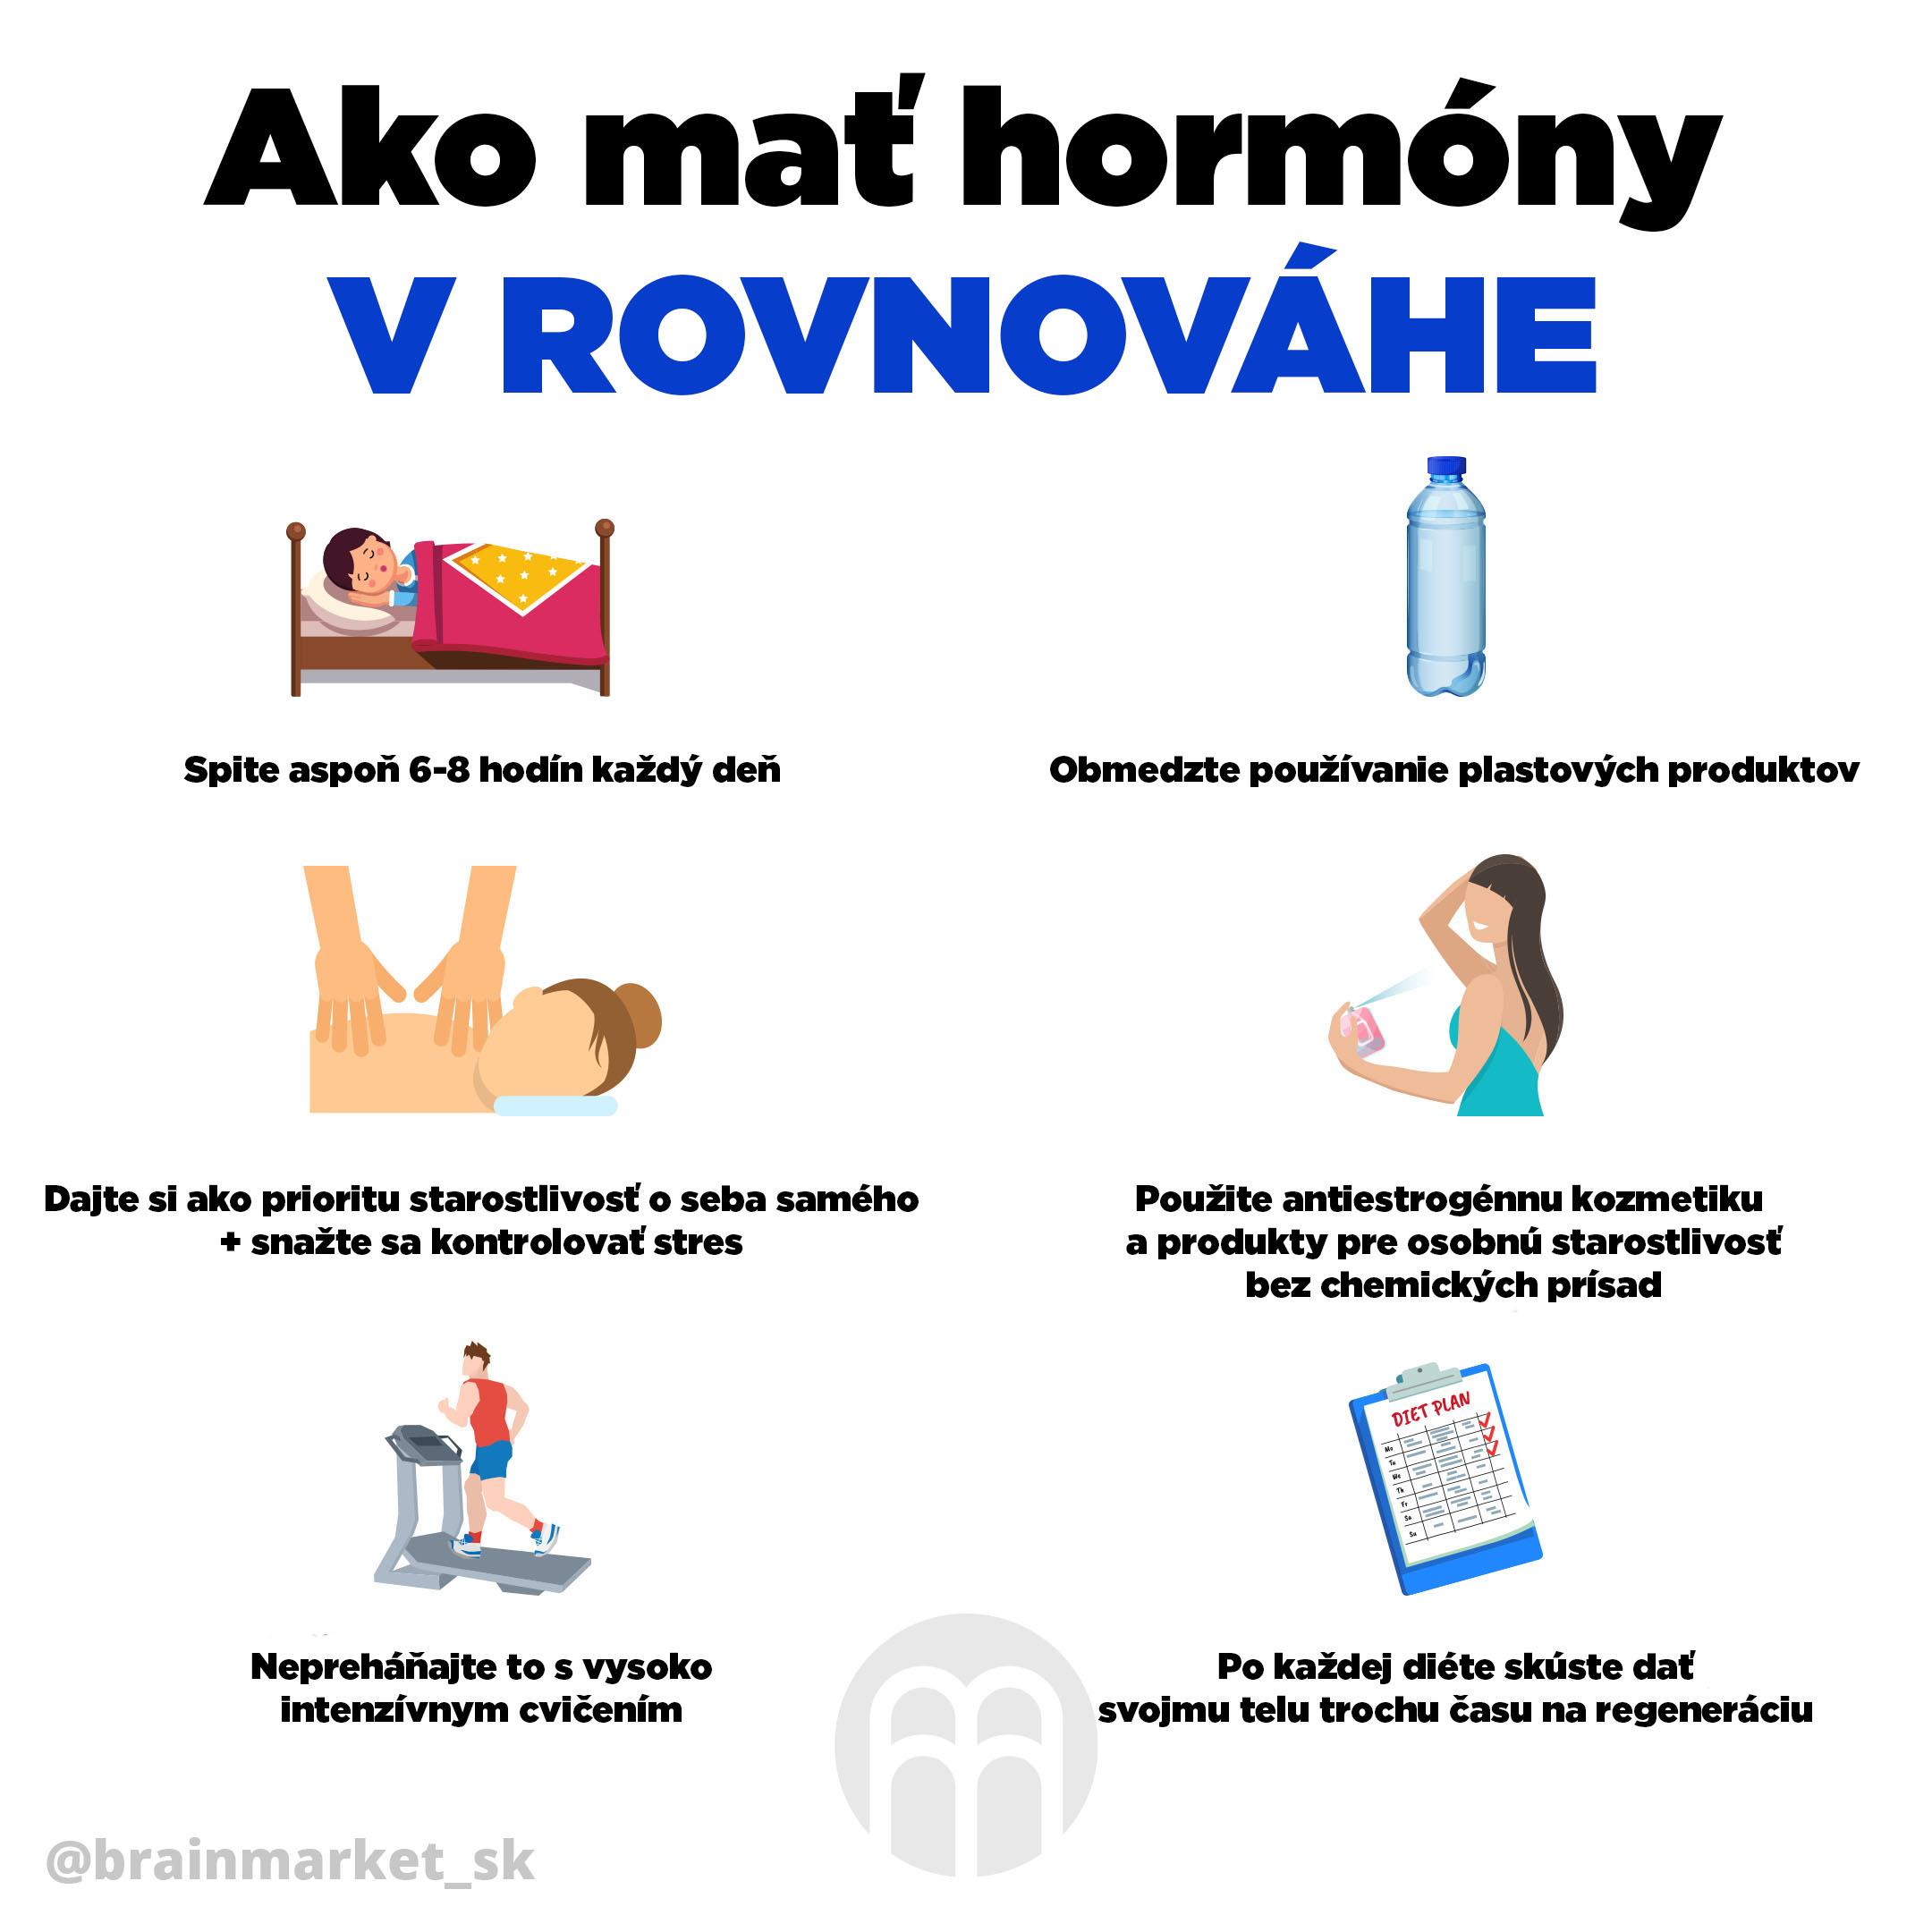 jak-mit-hormony-v-rovnovaze_SK